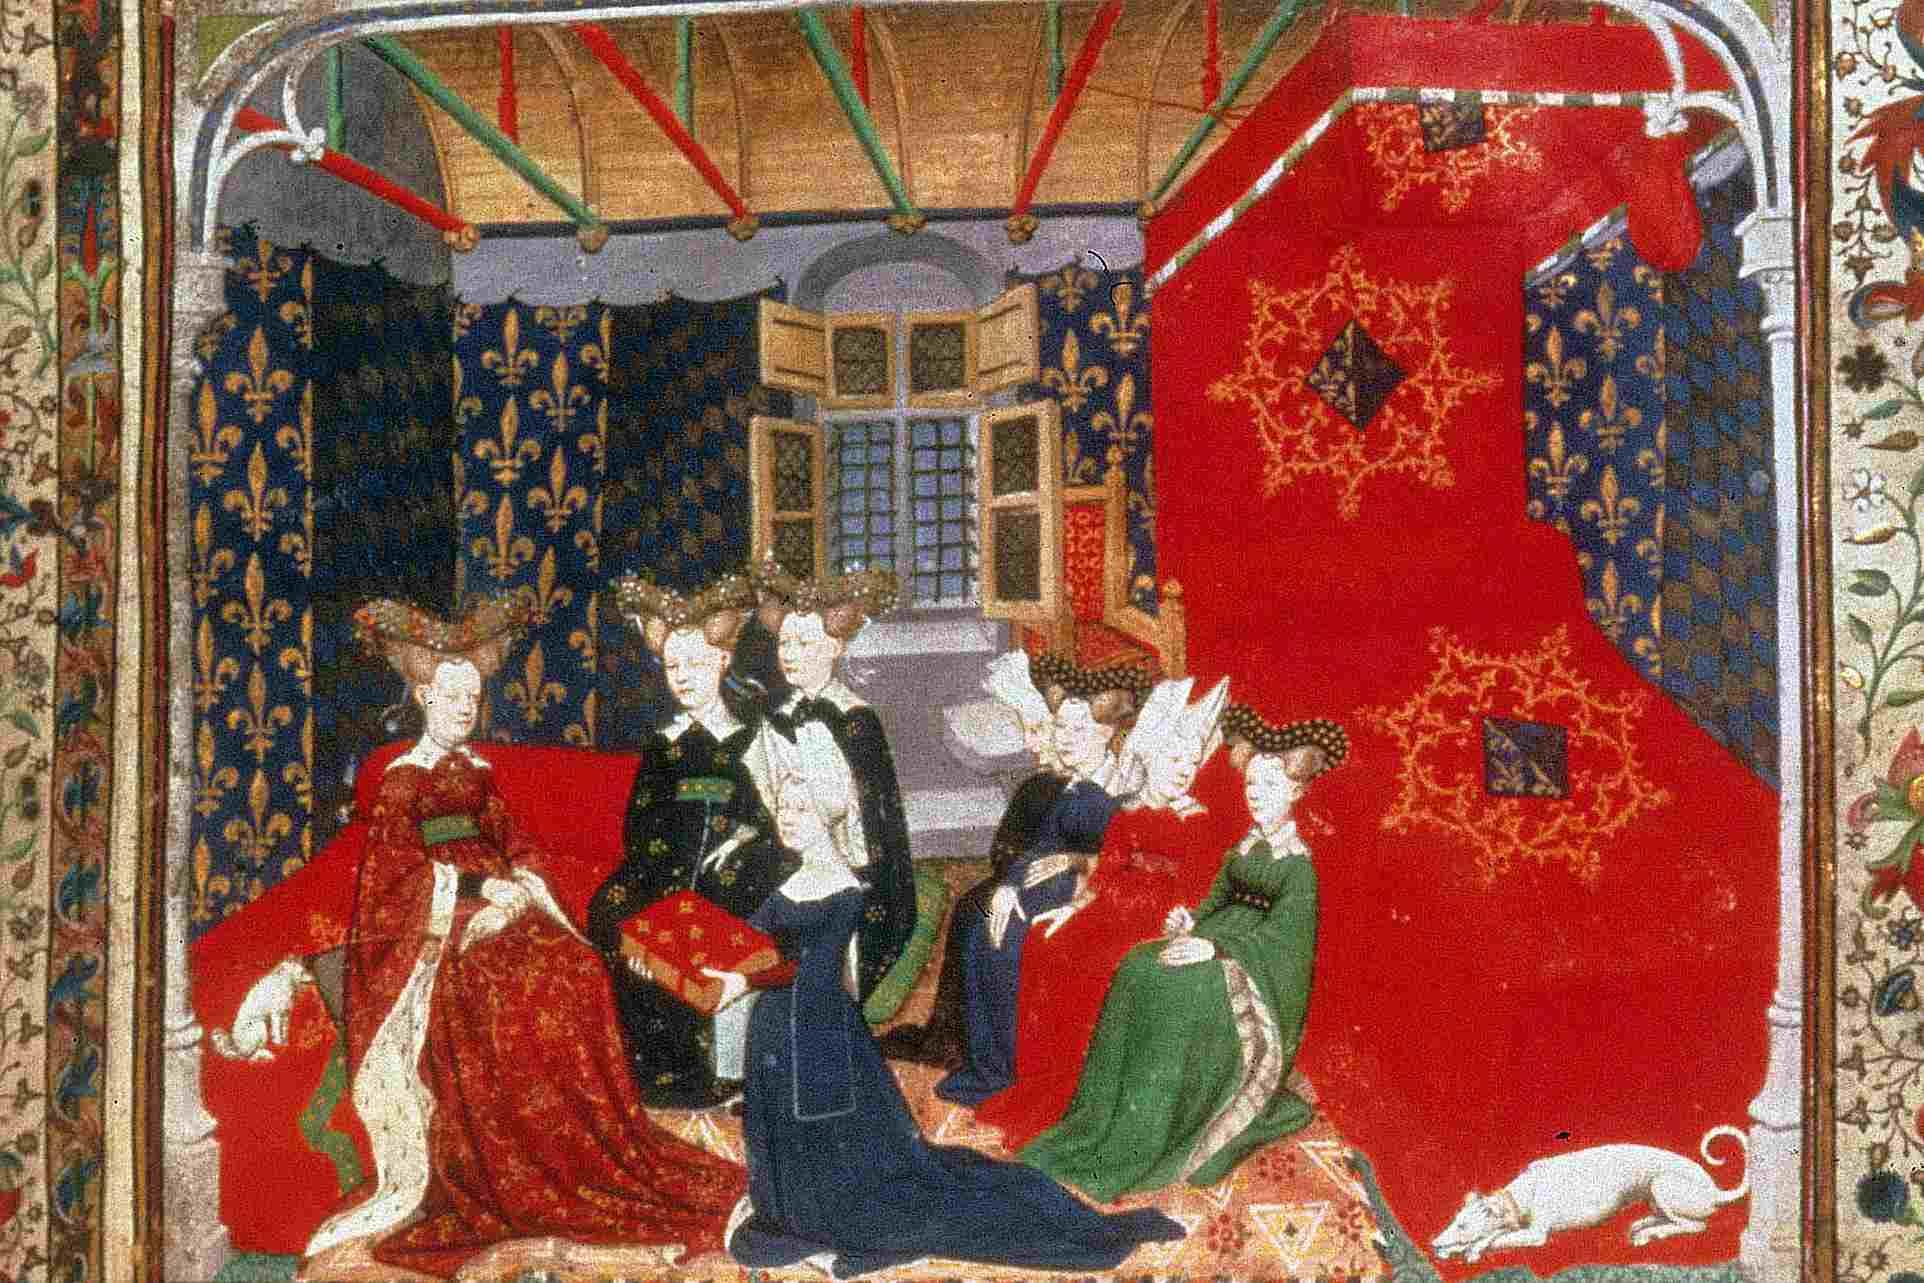 Christine de Pisan presents her book to French queen Isabeau de Baviere